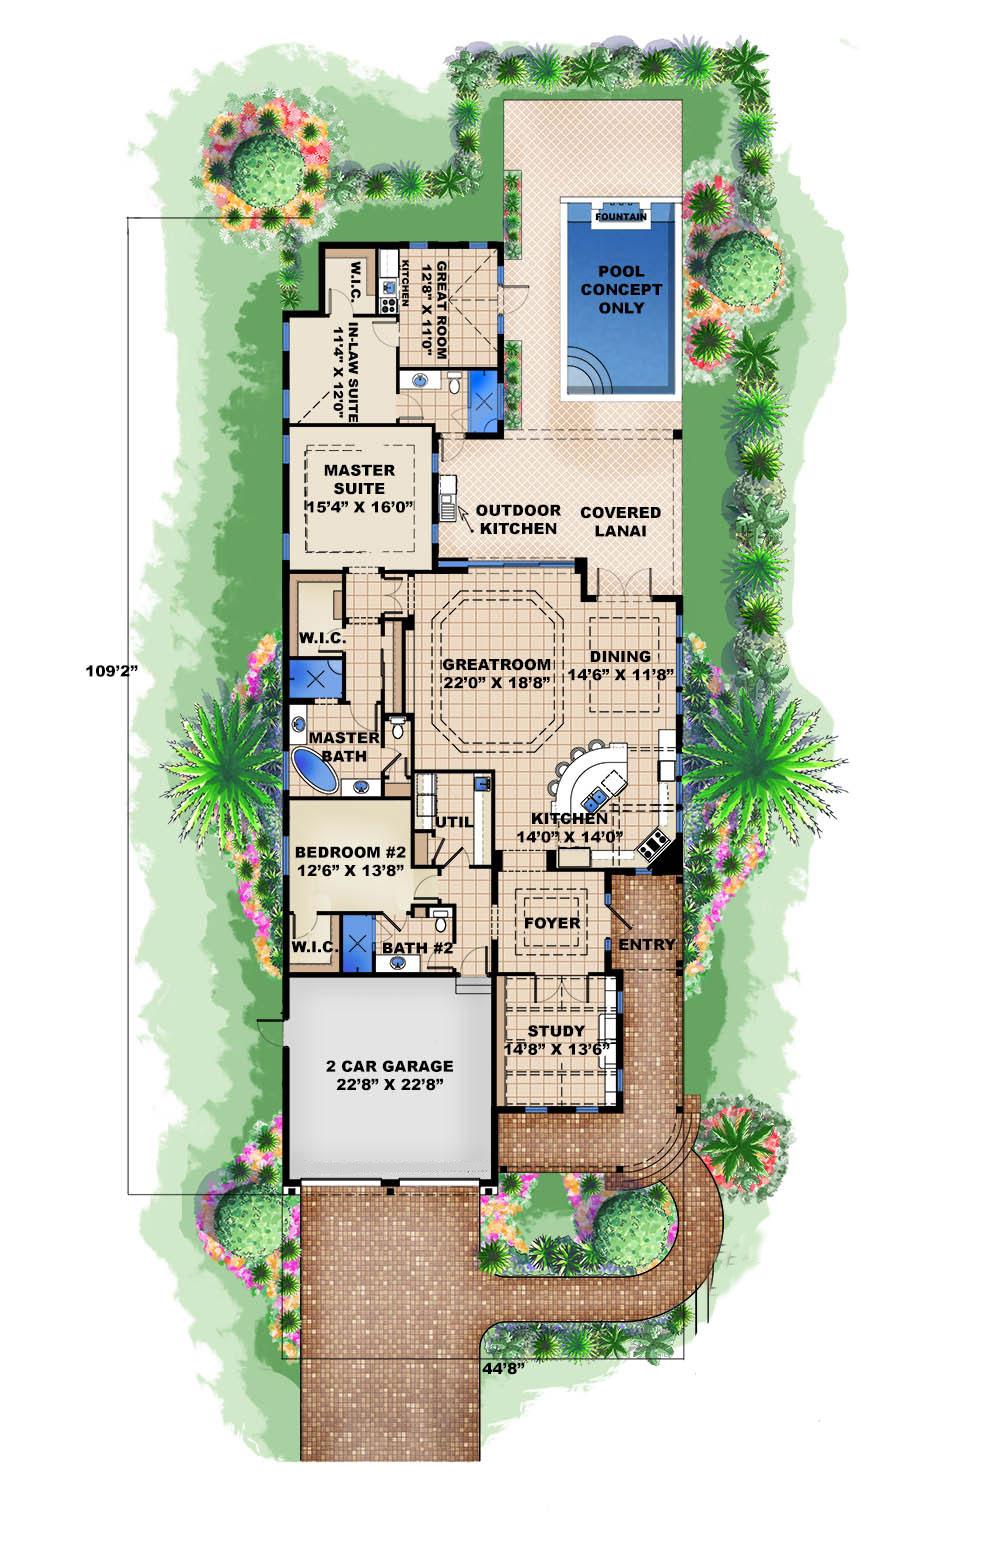 Coastal Home Plan 3 Bedrms 3 Baths 2972 Sq Ft 175 1250